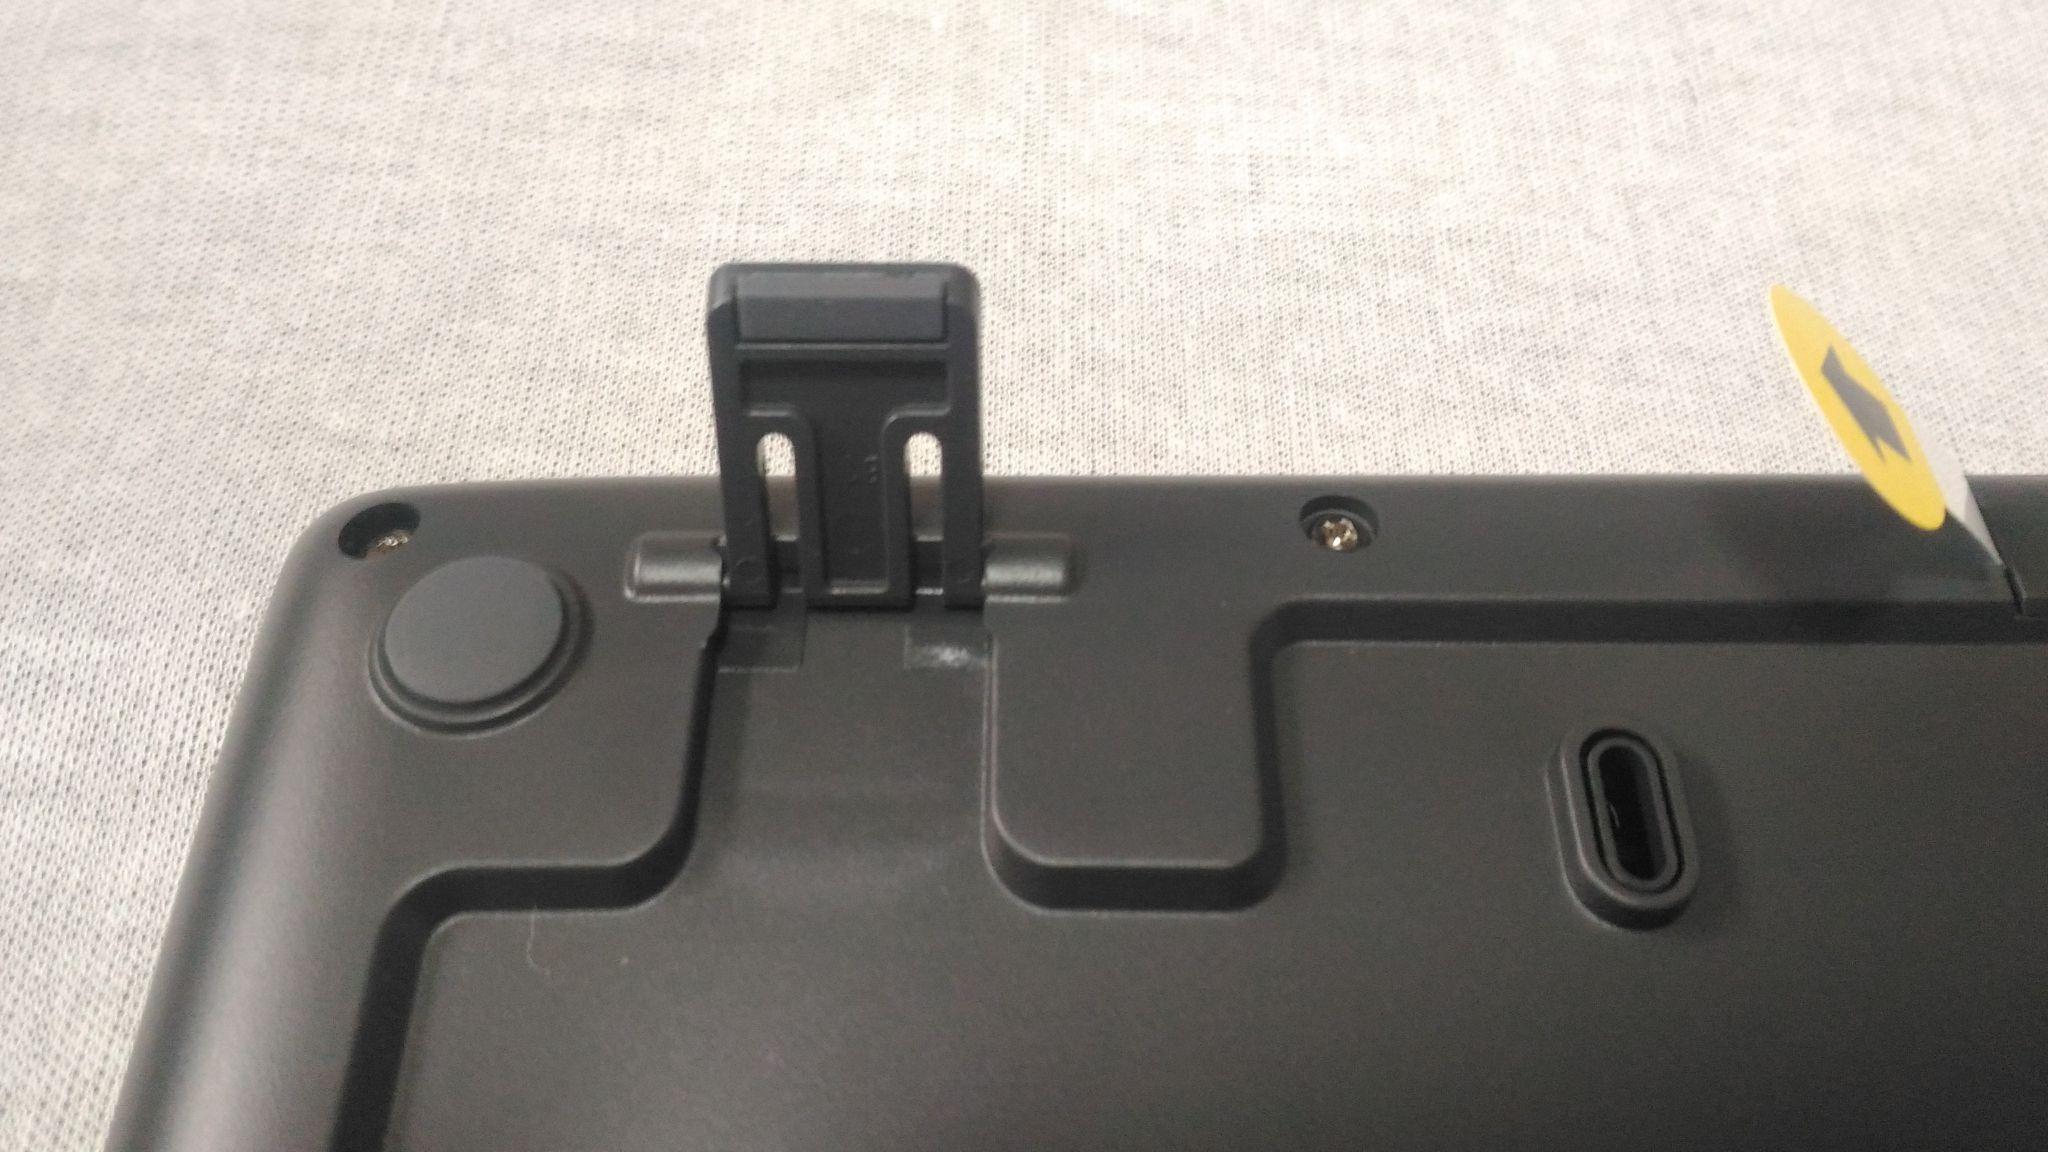 K275ワイヤレスキーボードの足